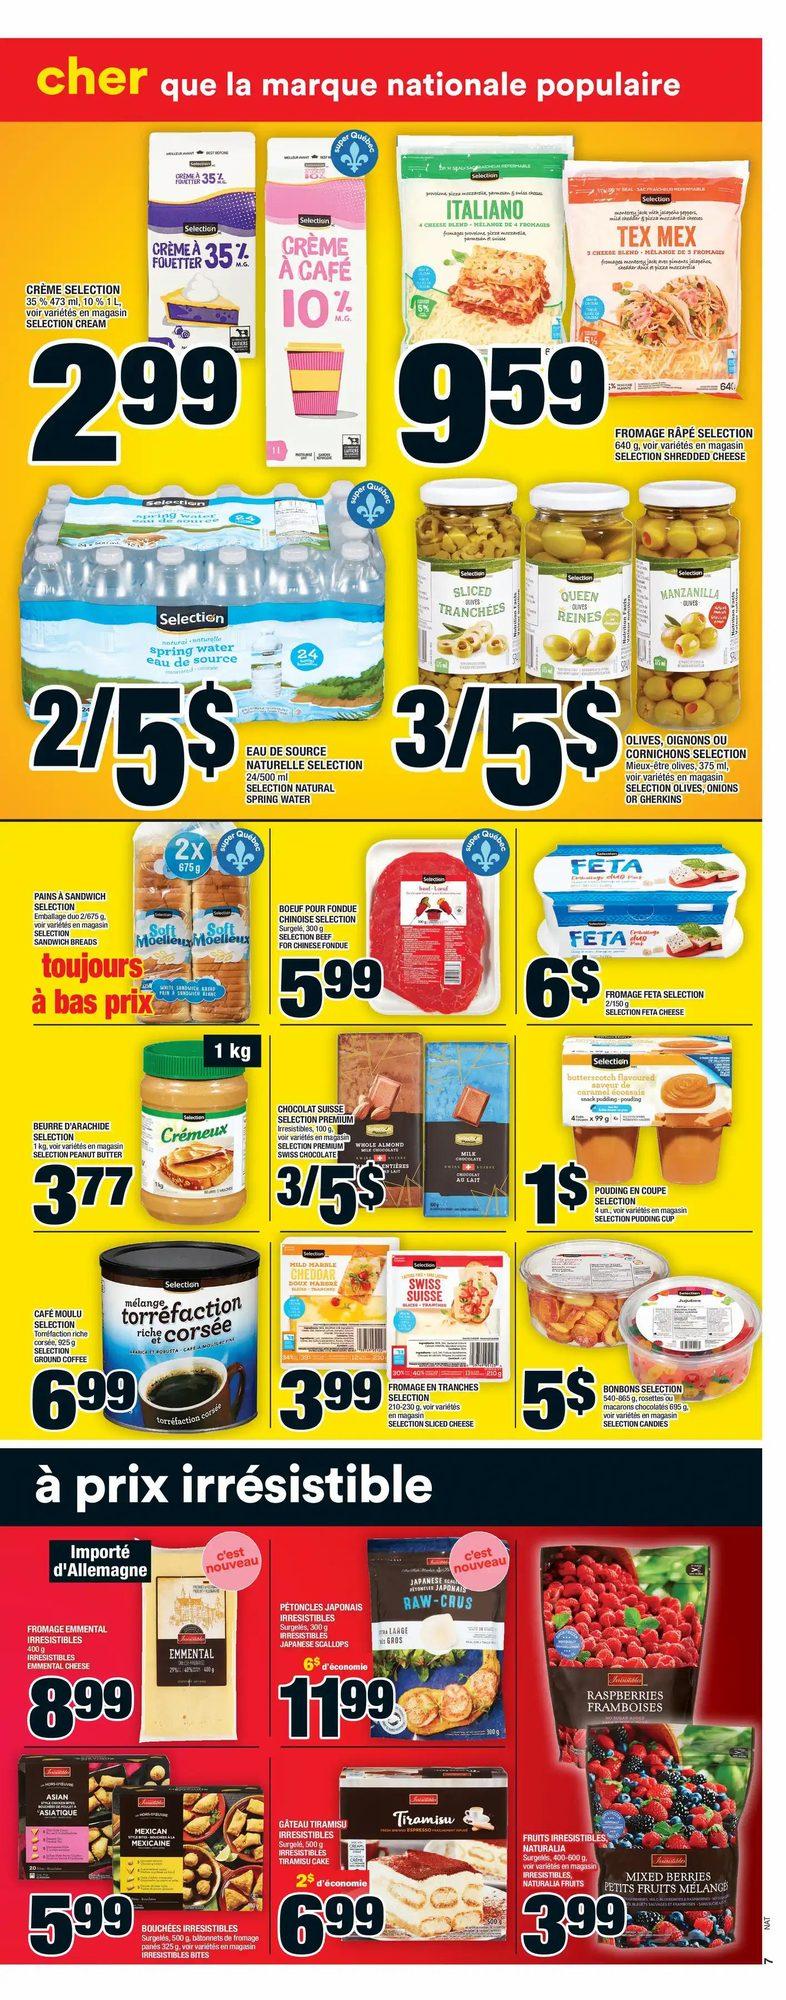 Super C - Weekly Flyer Specials - Page 12